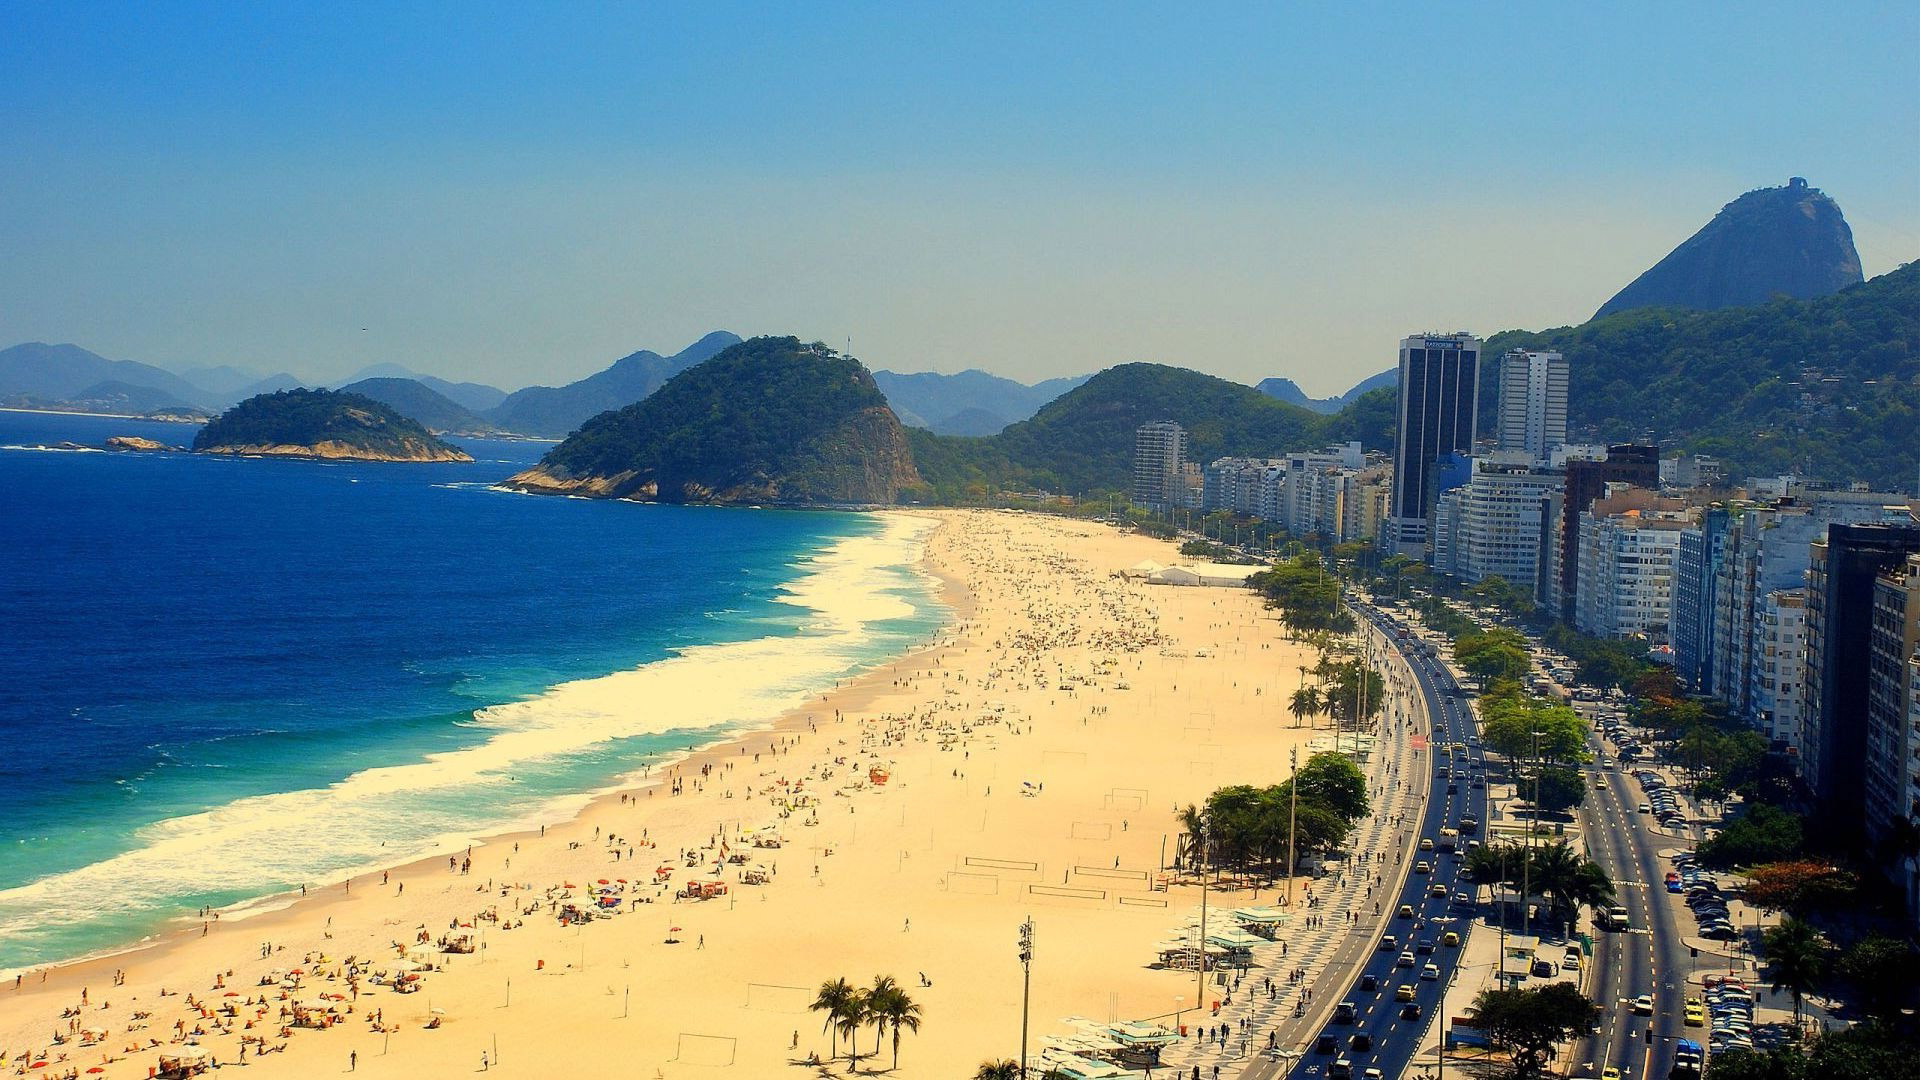 Rio de Janeiro Wallpapers Images Photos Pictures Backgrounds 1920x1080